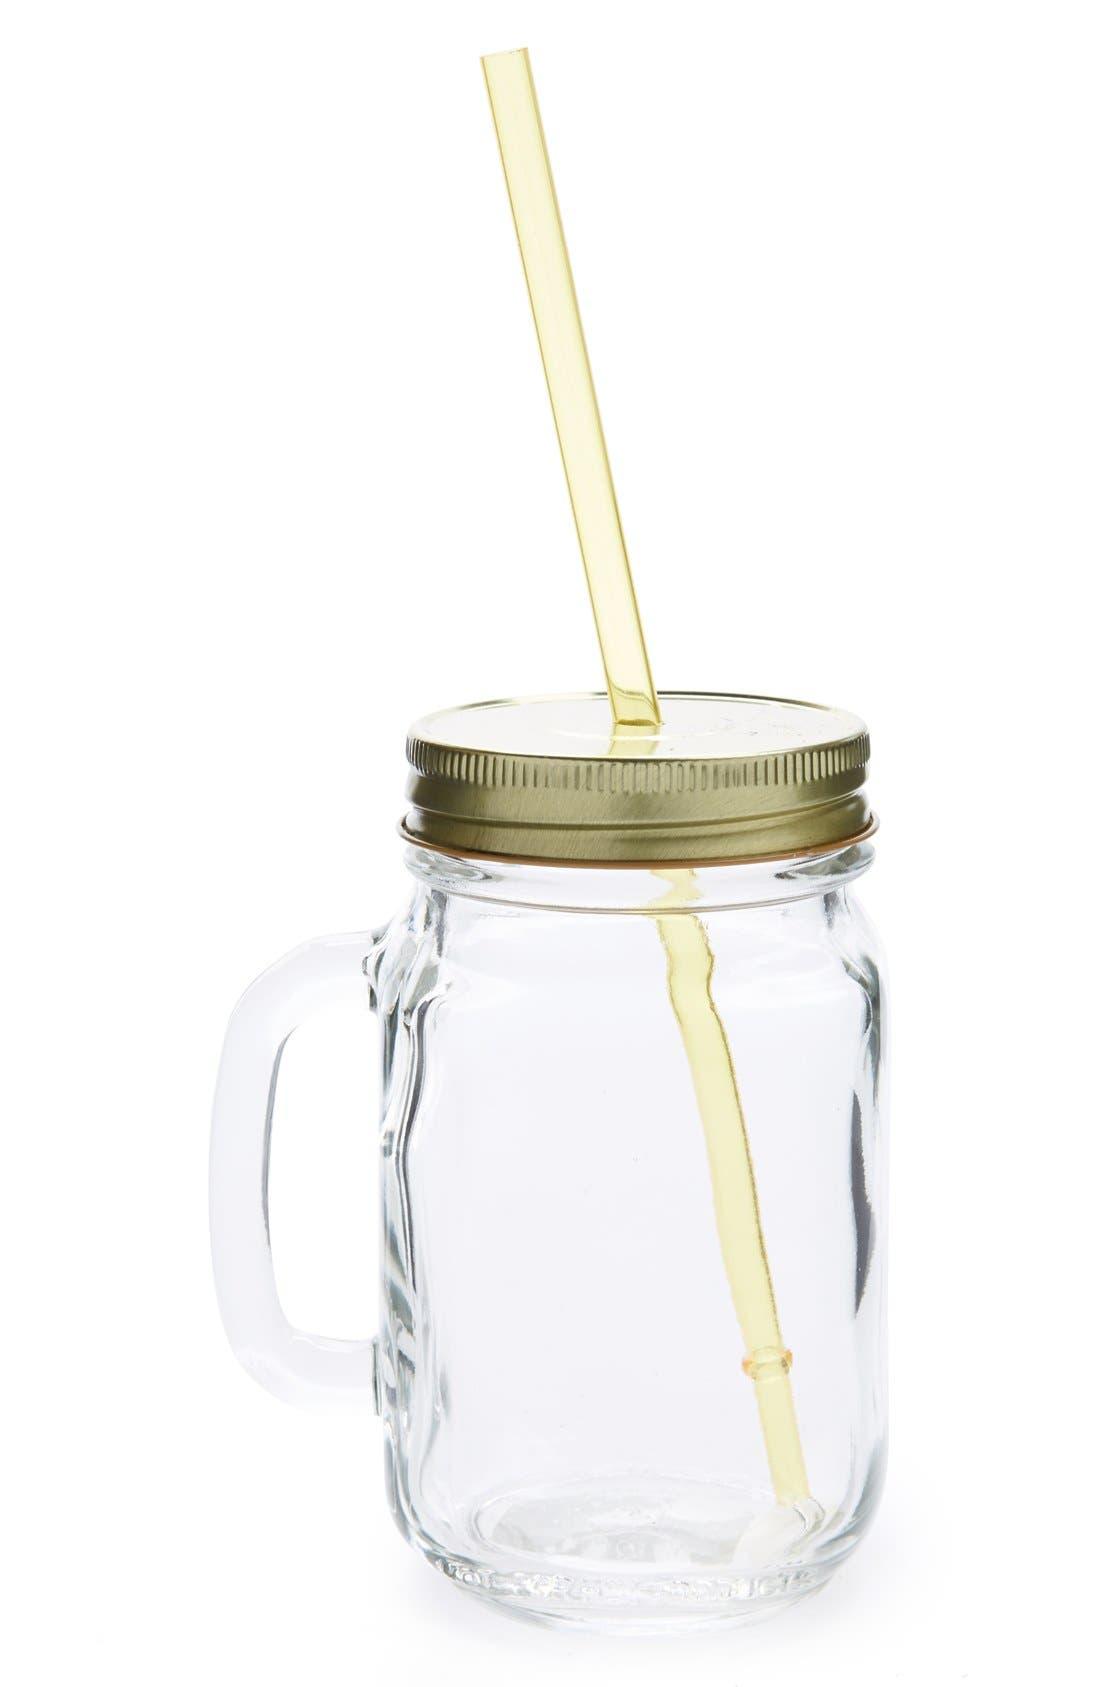 Main Image - Ad-N-Art 'Shindig' Glass Mug